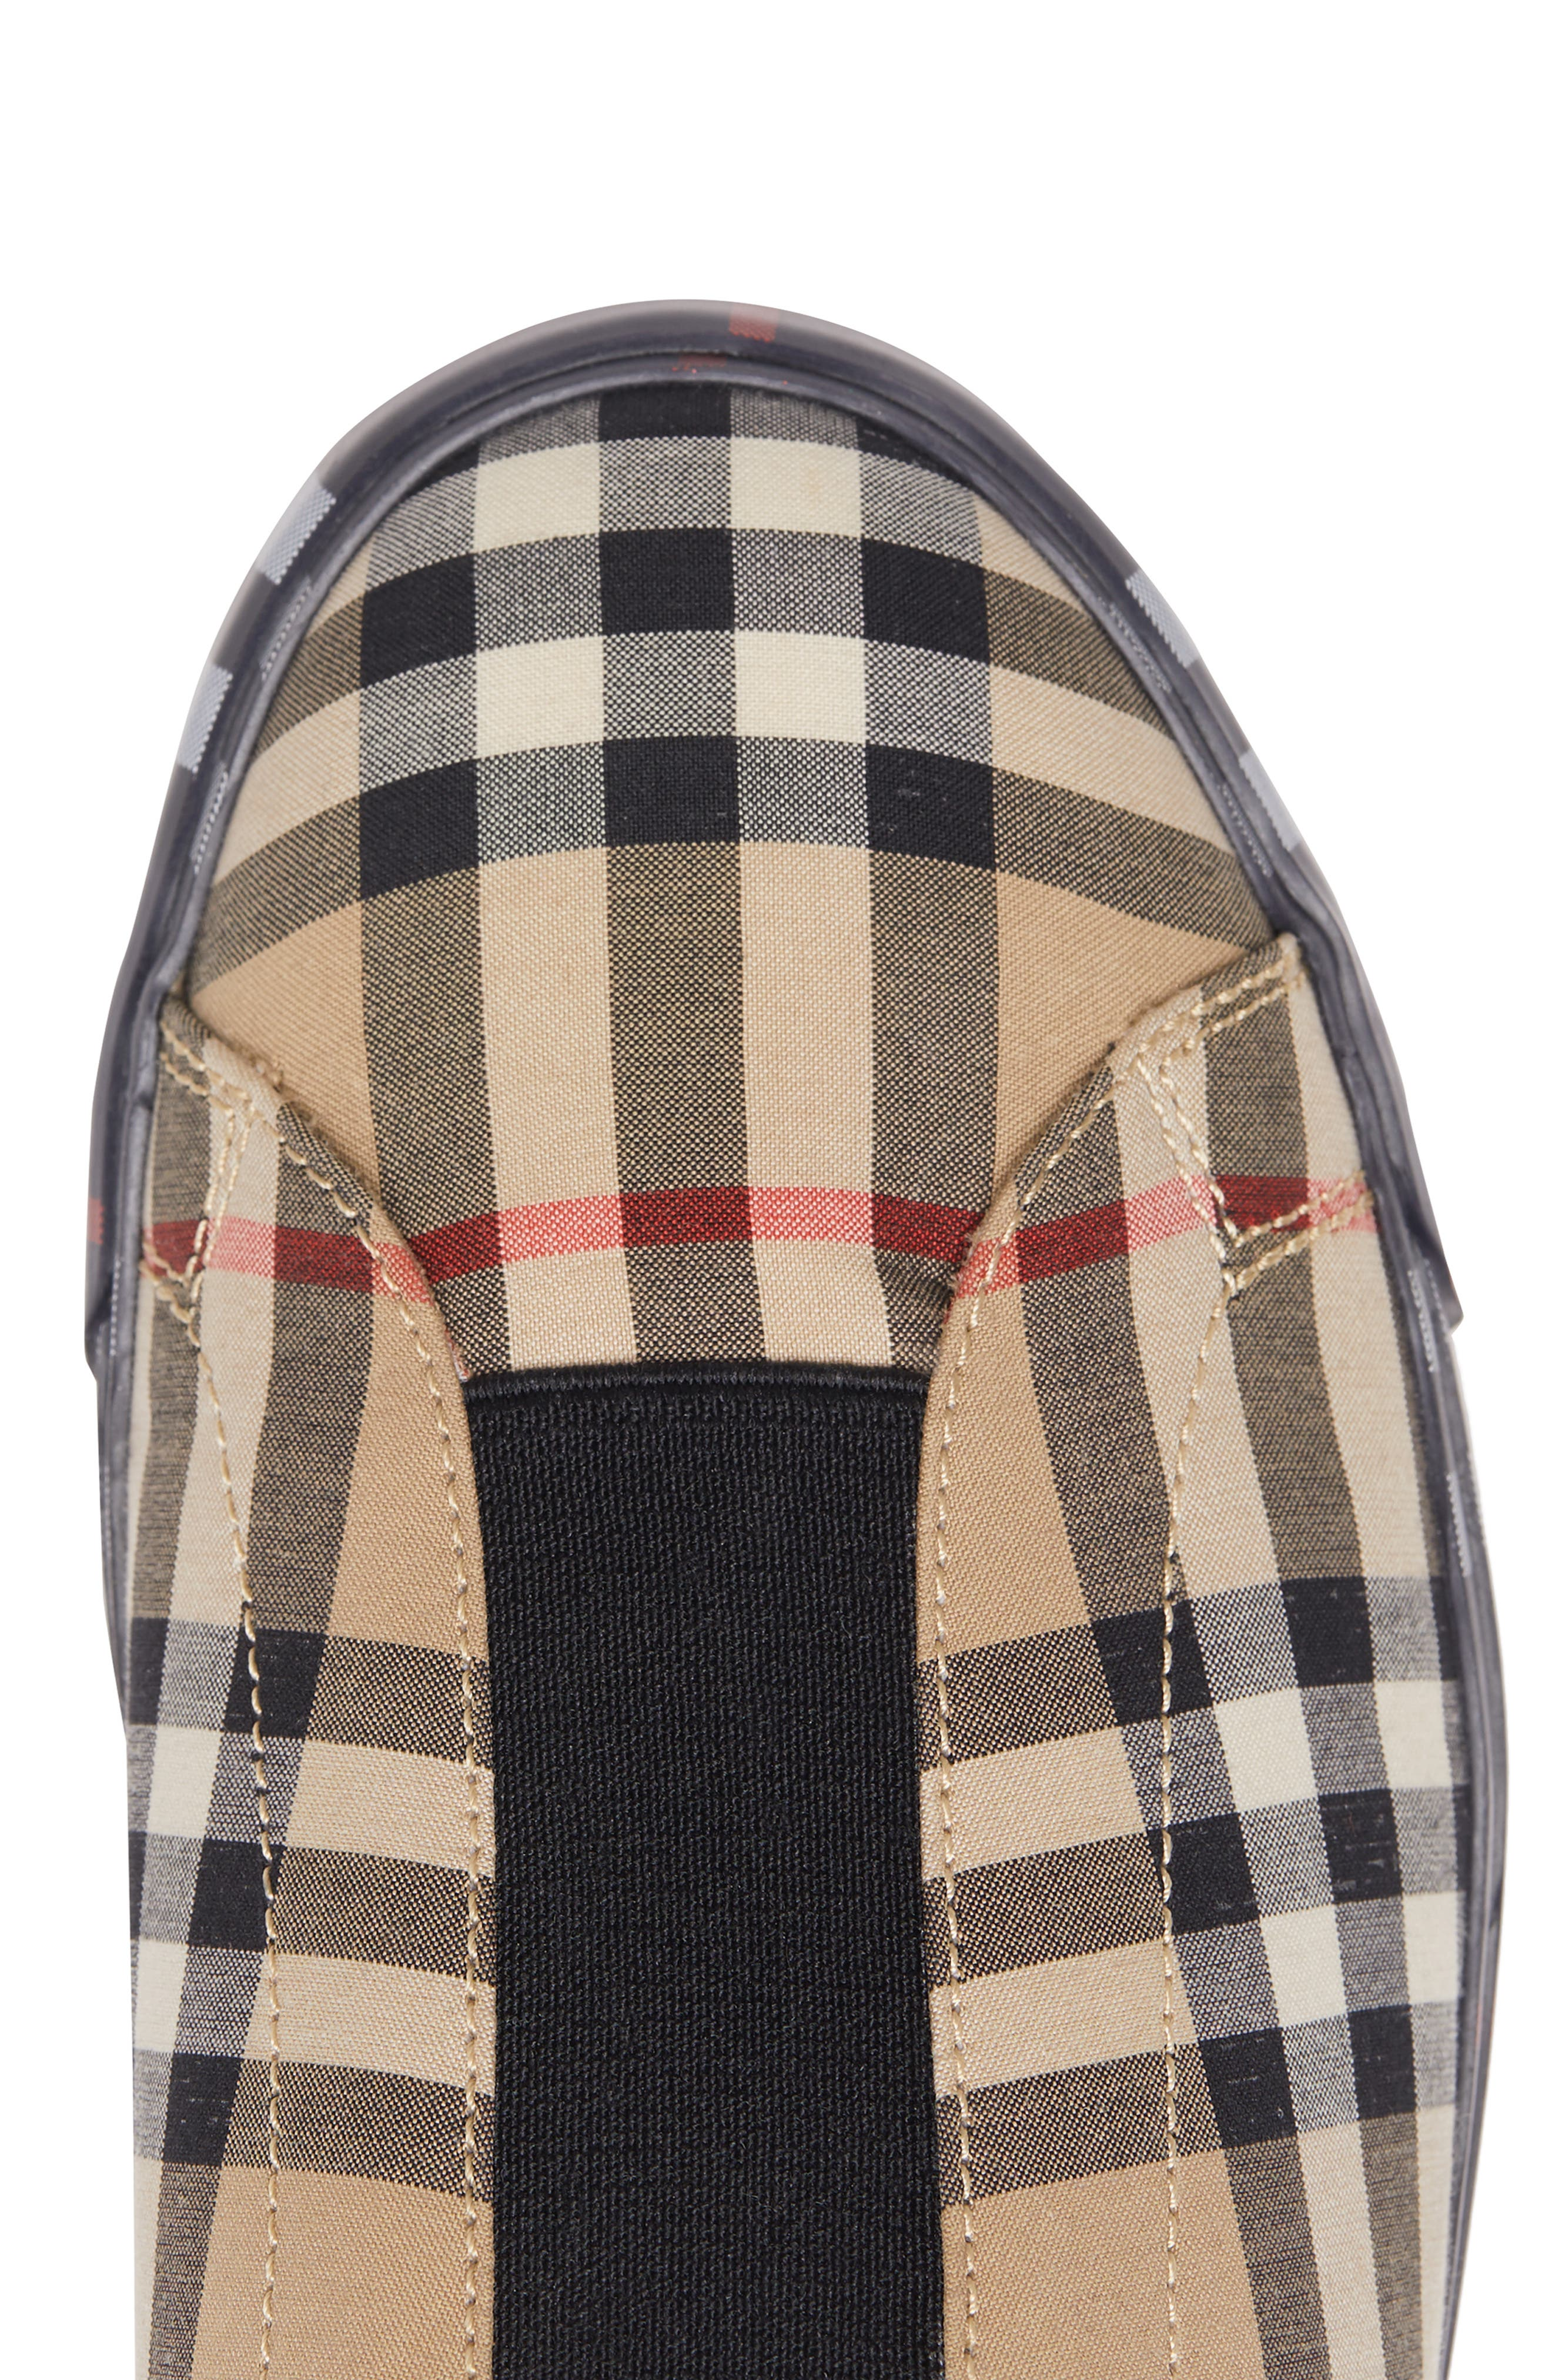 BURBERRY, Markham Vintage Check Slip-On Sneaker, Alternate thumbnail 7, color, BEIGE PLAID